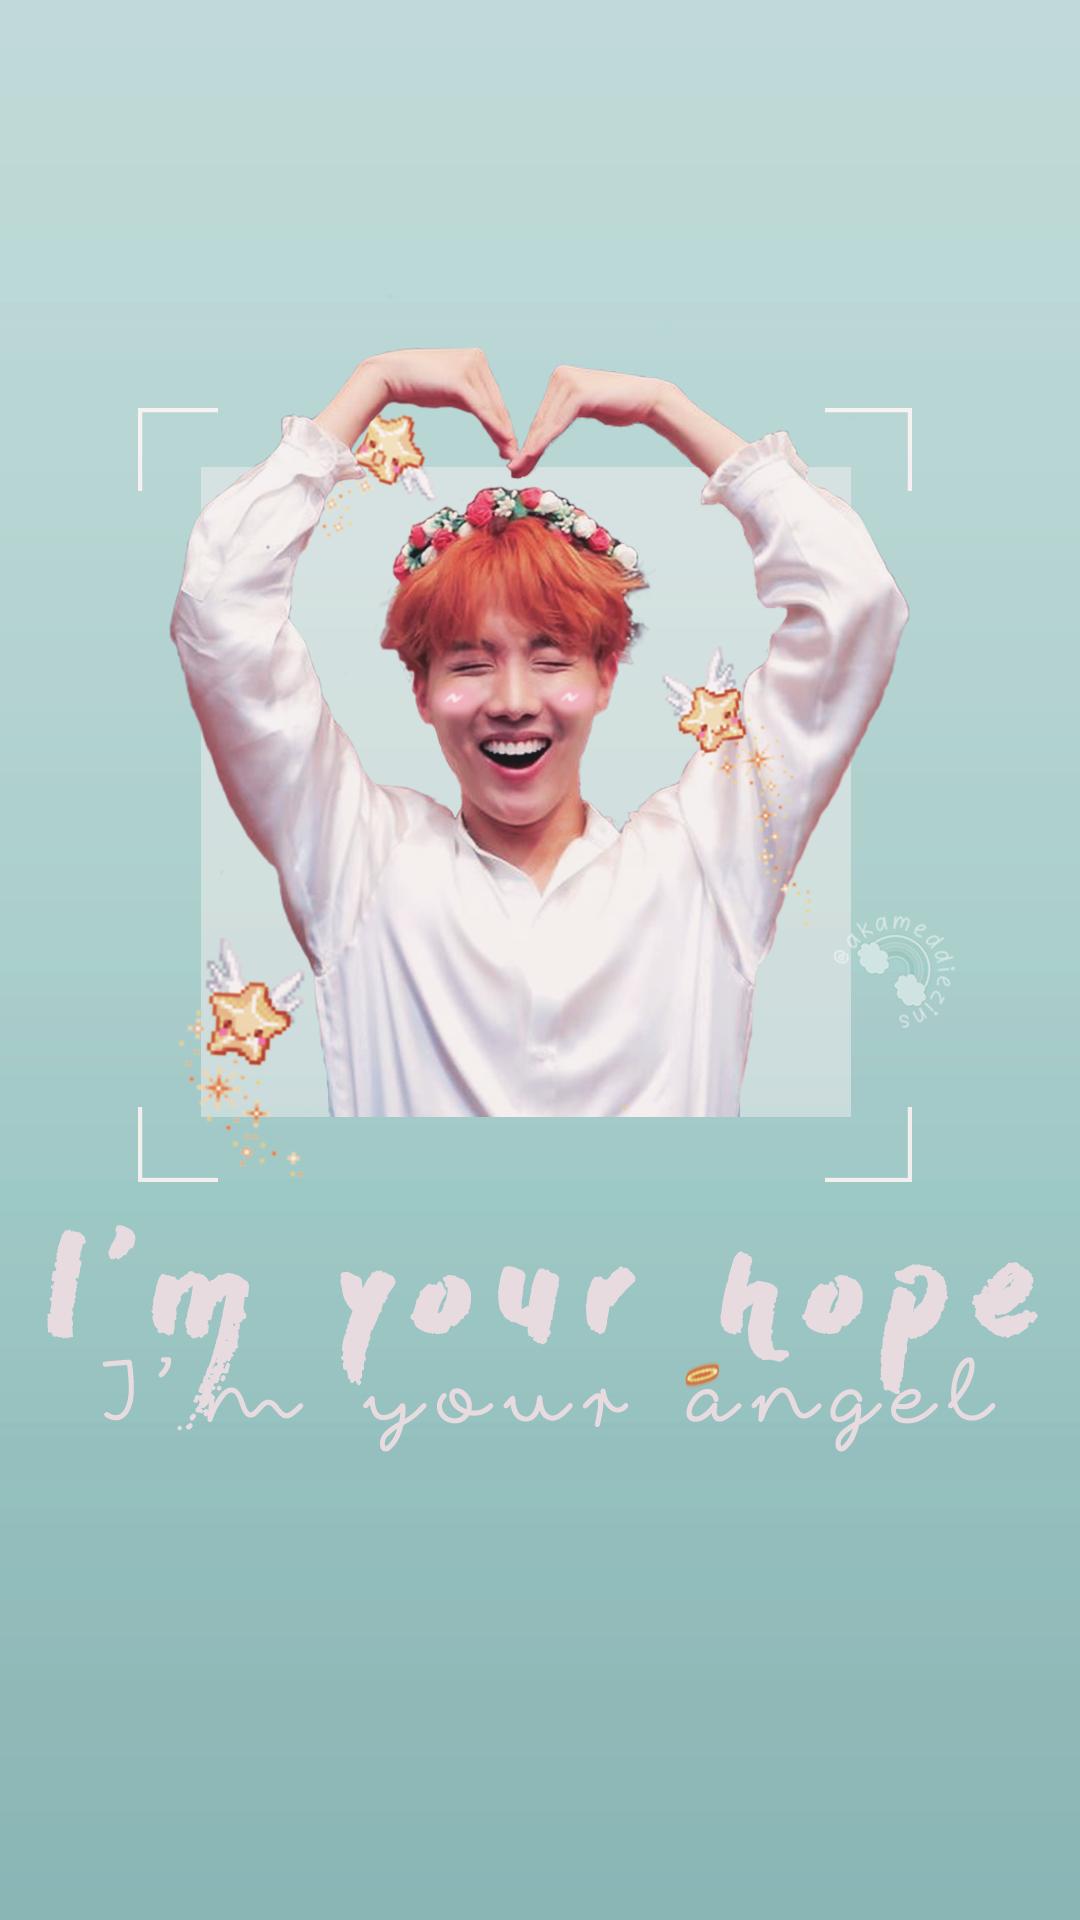 Jung Hoseok J Hope Cute Bts Wallpaper Lockscreen I M Your Hope I M Your Angel Hobi 3 Hope Wallpaper Cute Love Wallpapers Bts Wallpaper